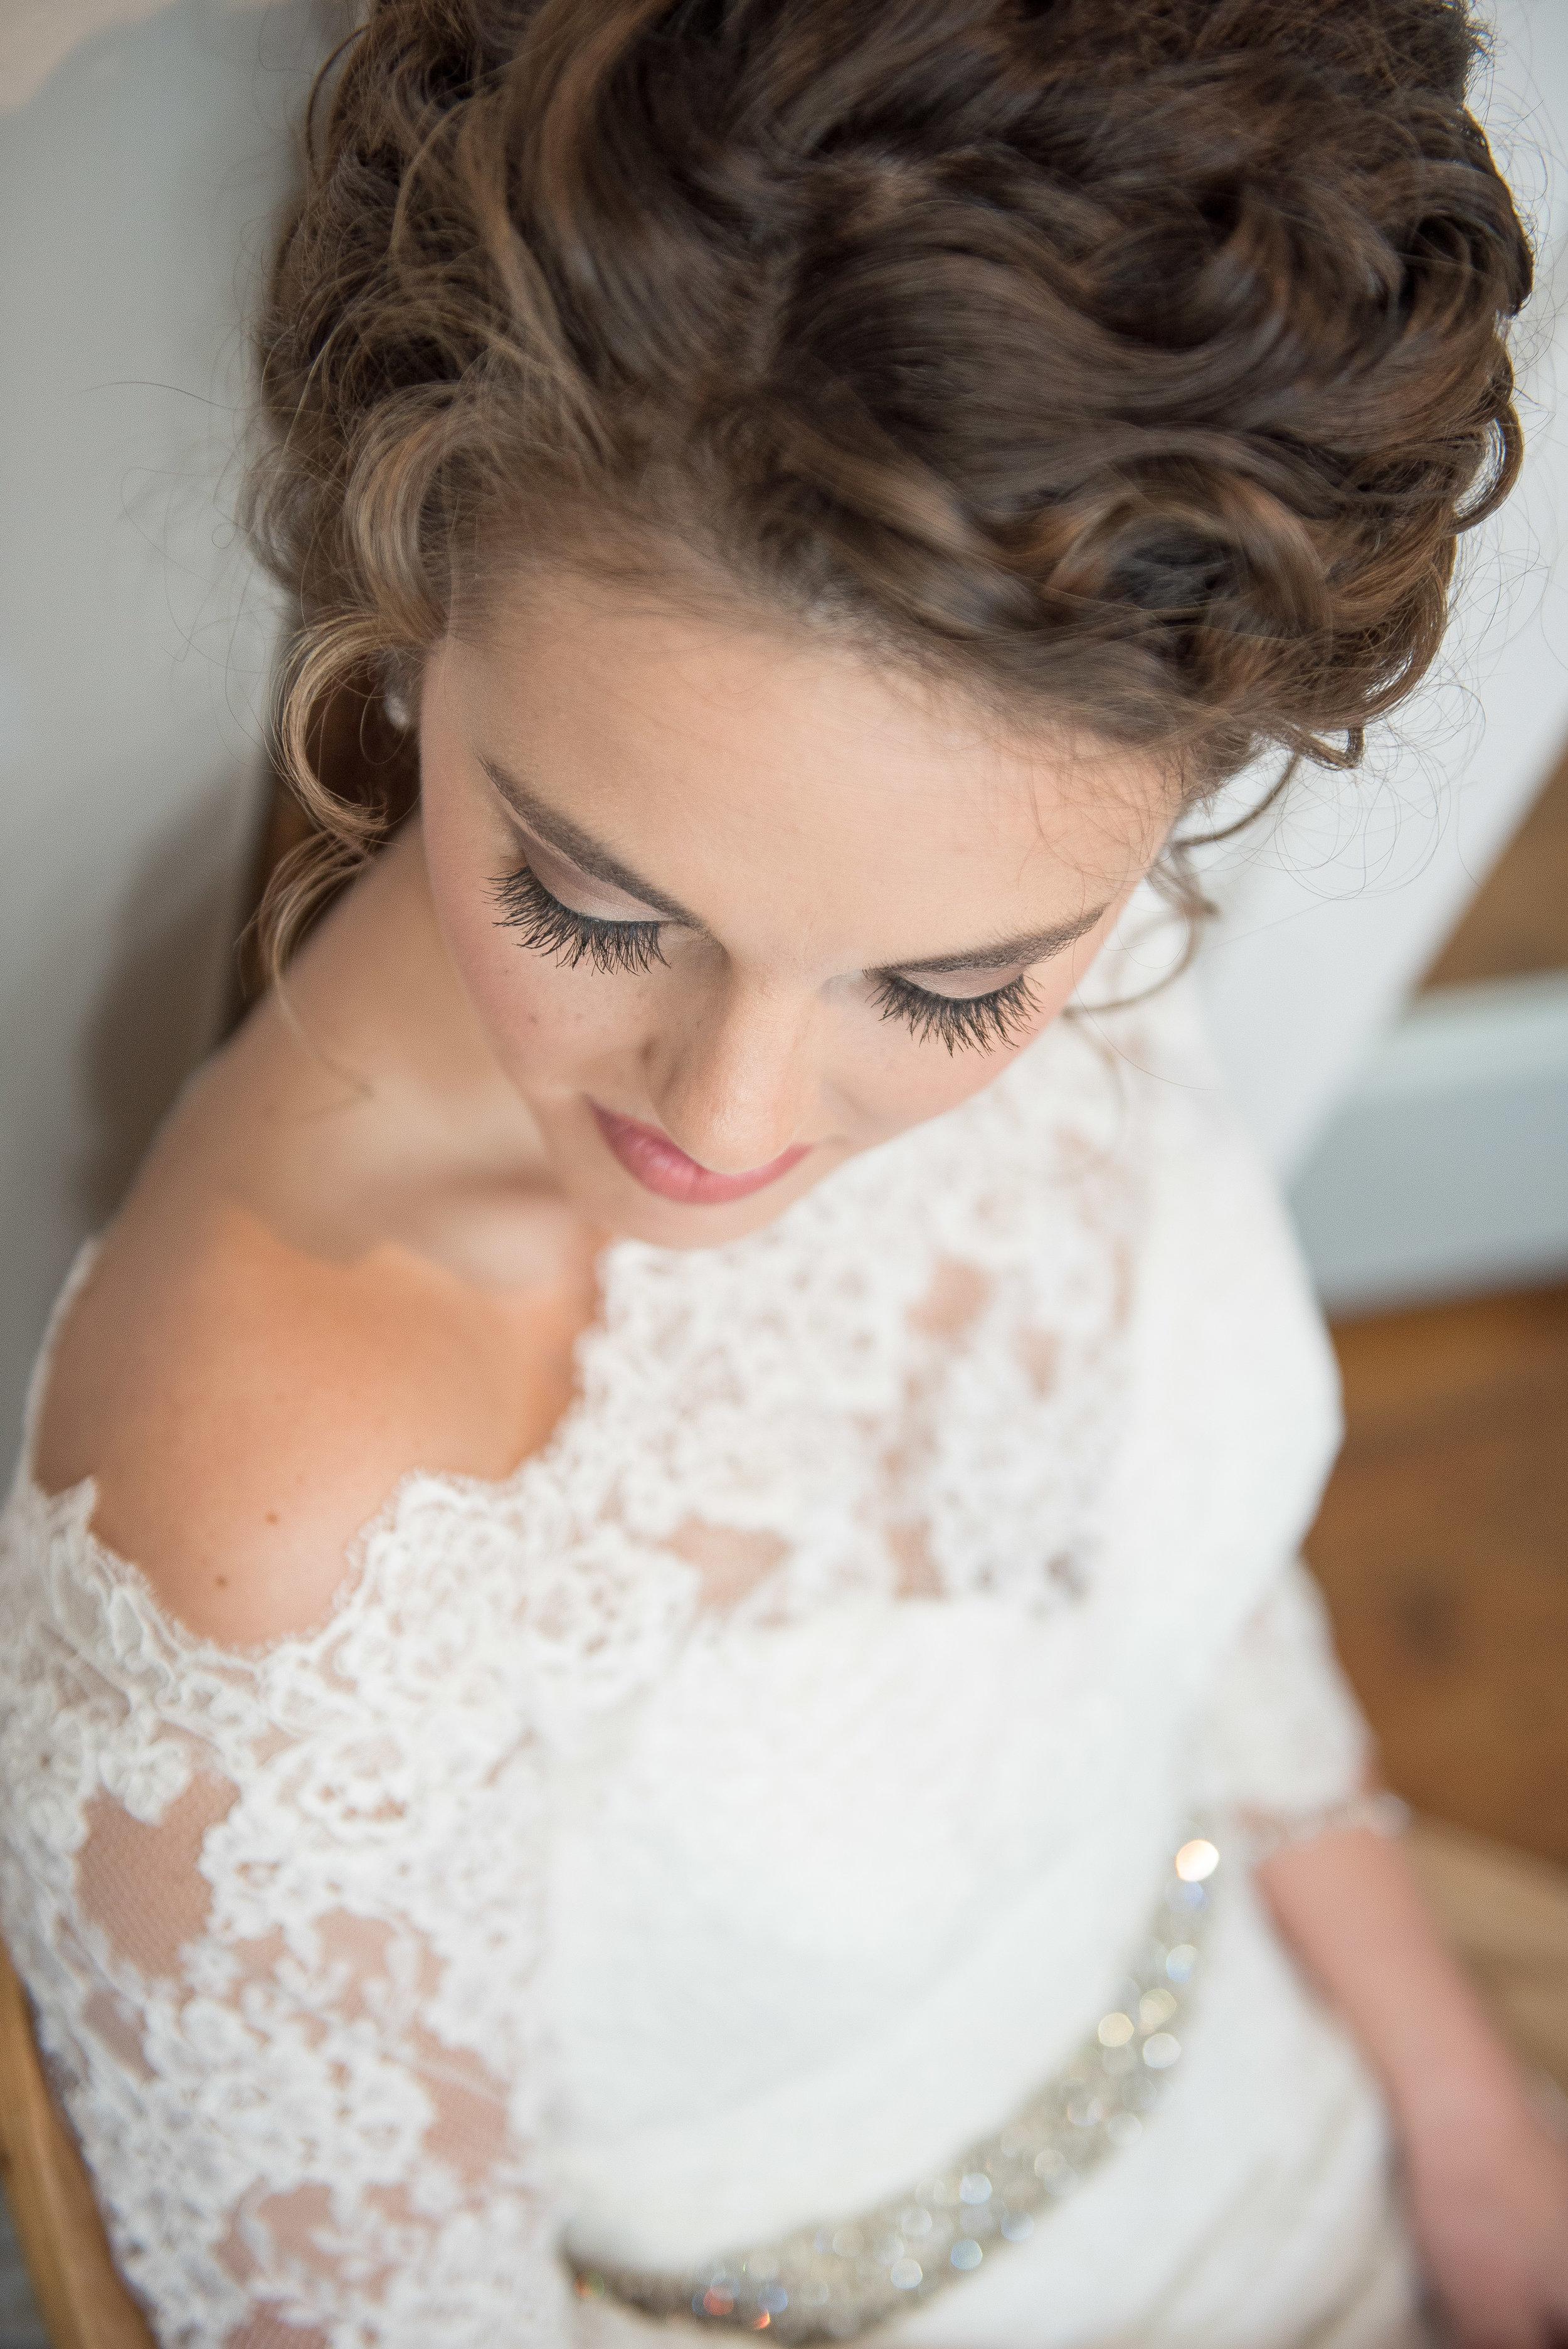 The Roller Mill Events - Winston Salem Weddings - NC Weddings - High Point NC Weddings - Winston Salem Venue - Yasmin Leonard Photography-21.jpg